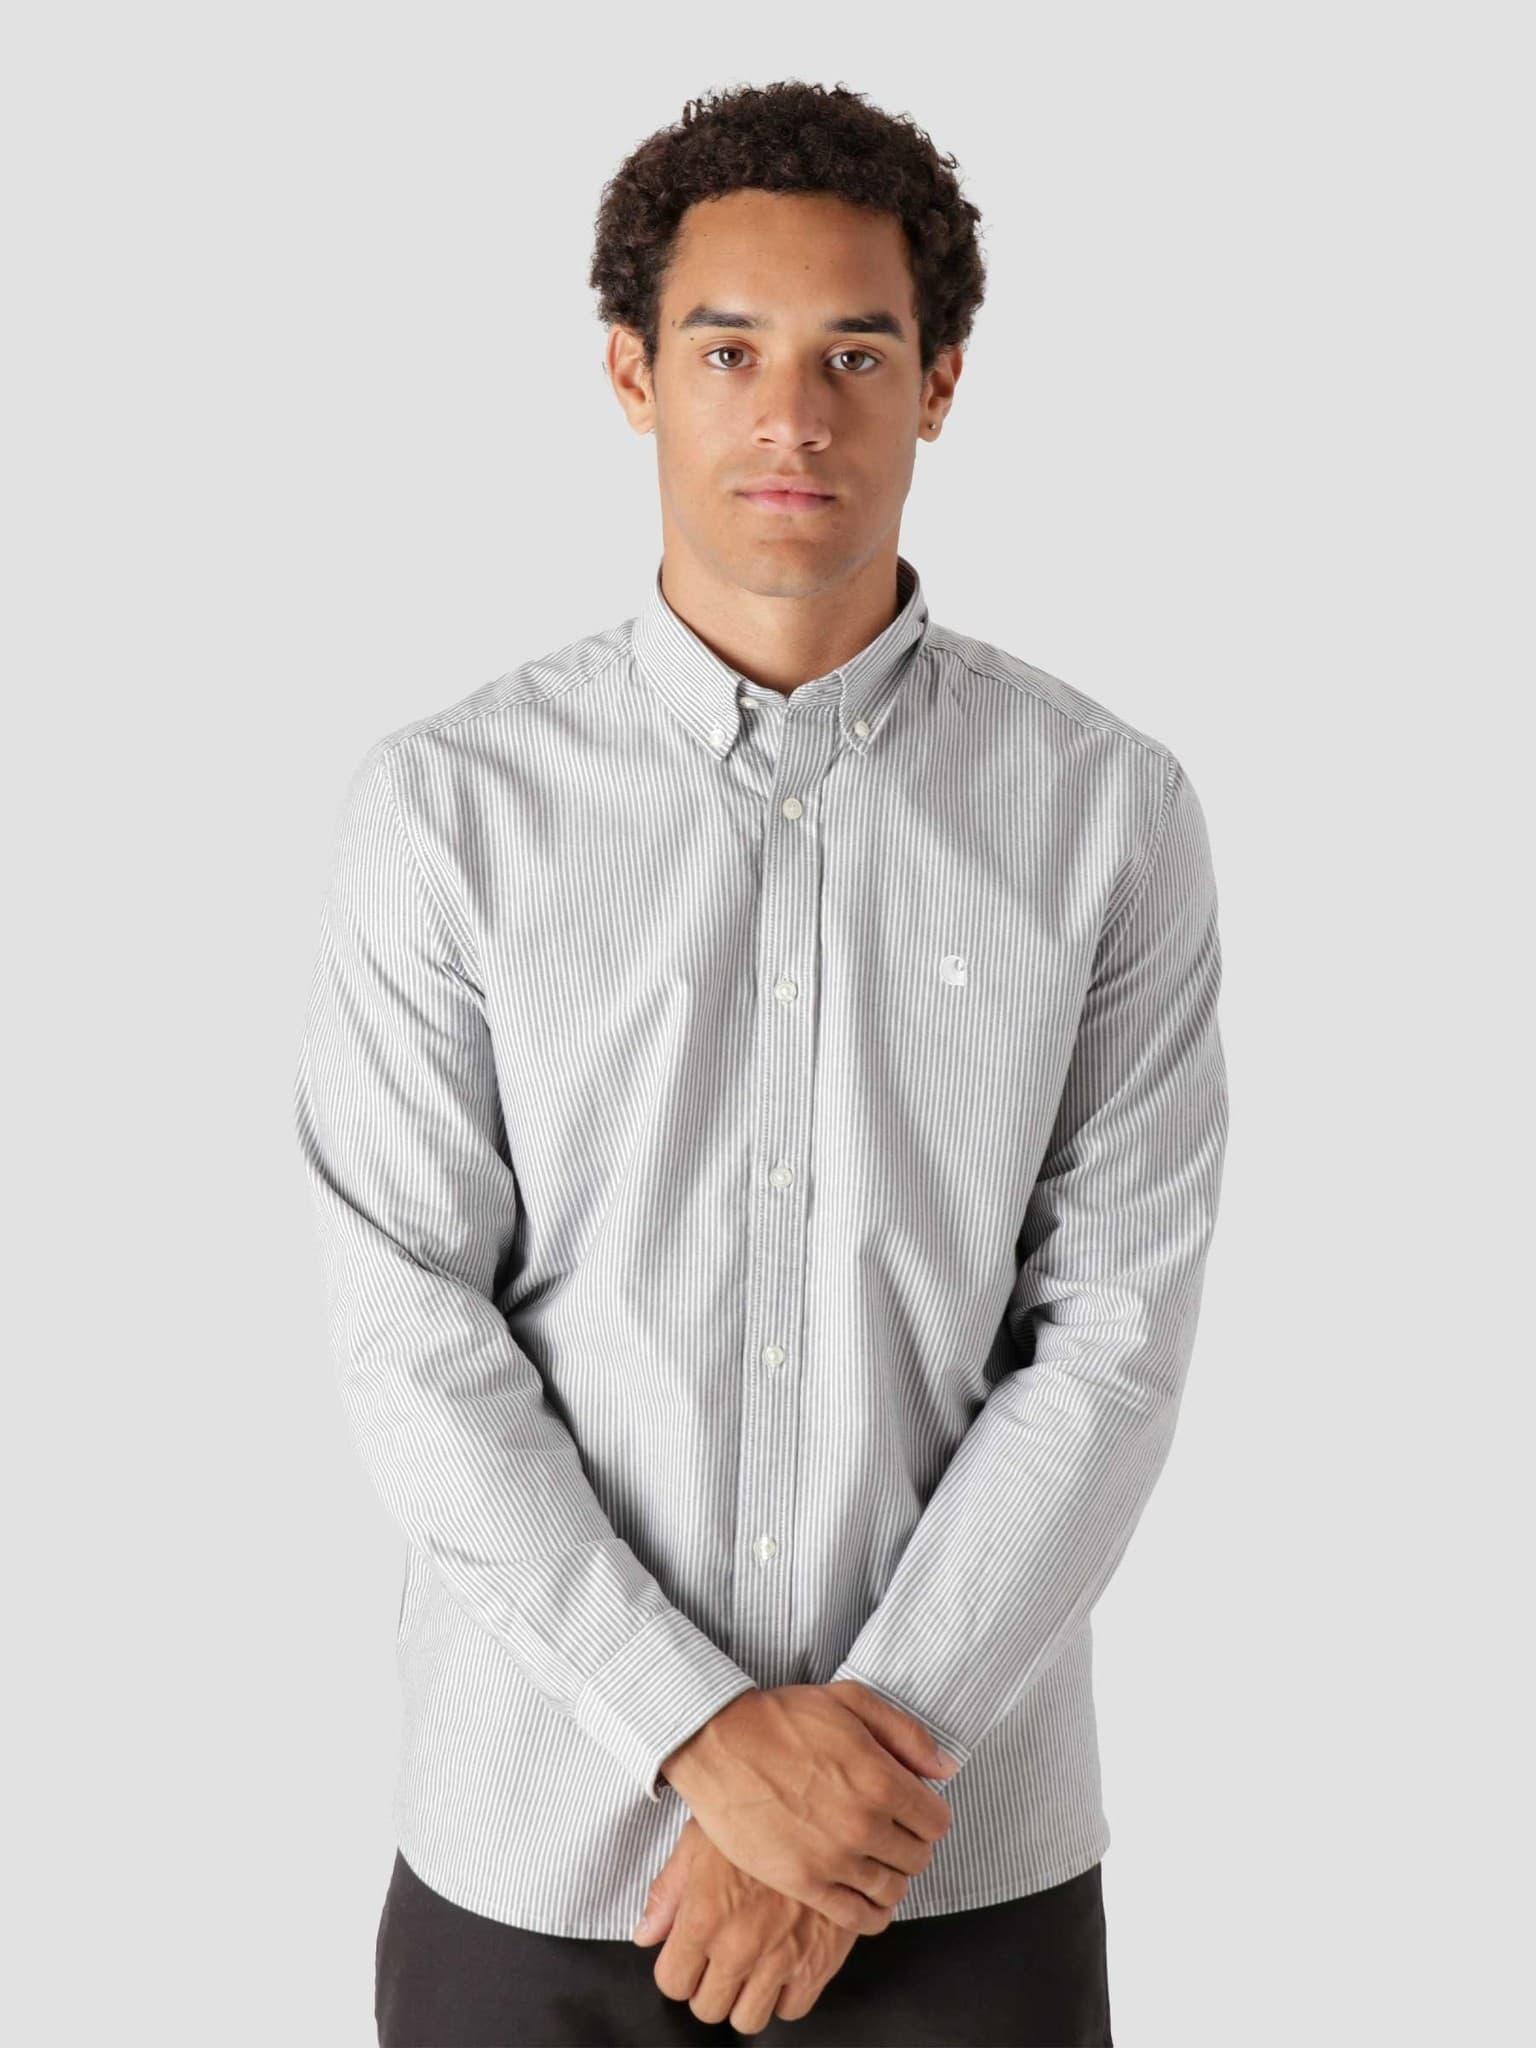 Longsleeve Duffield Shirt Duffield Stripe Black White I025245-8990